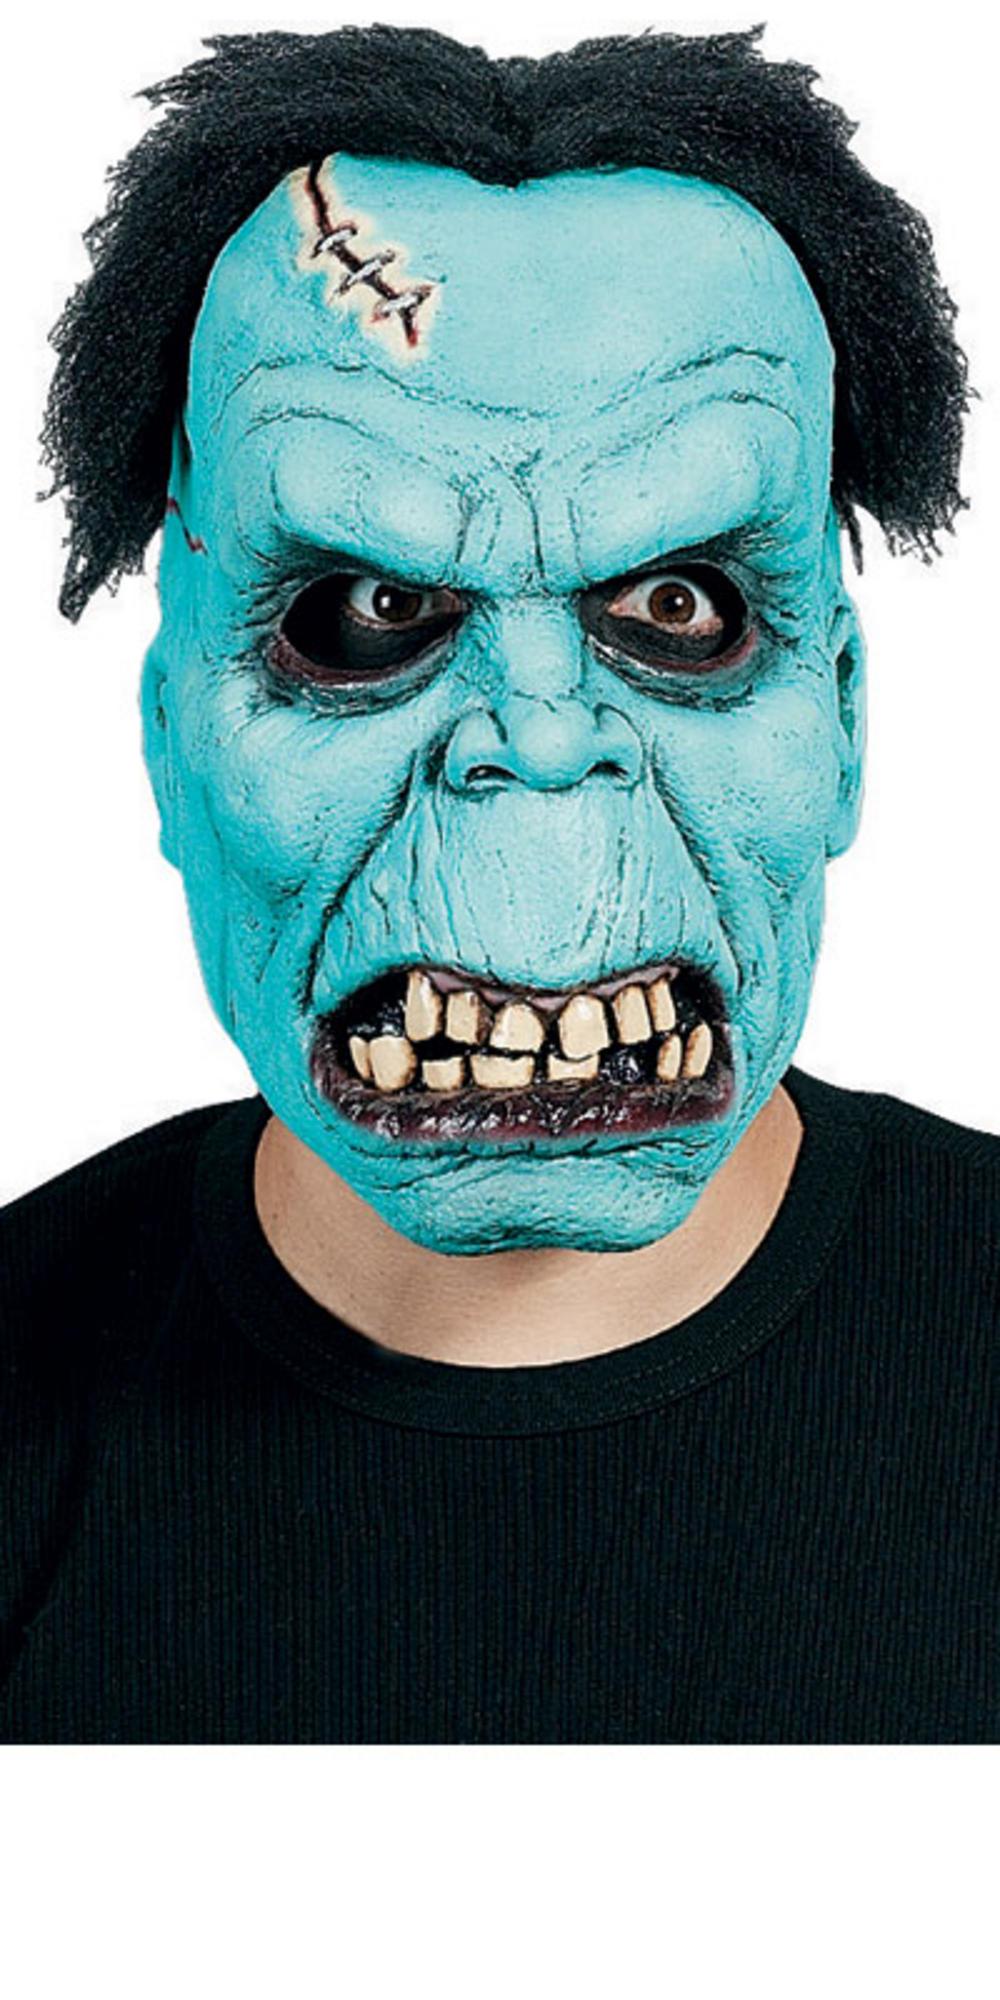 Fancy dress latex masks